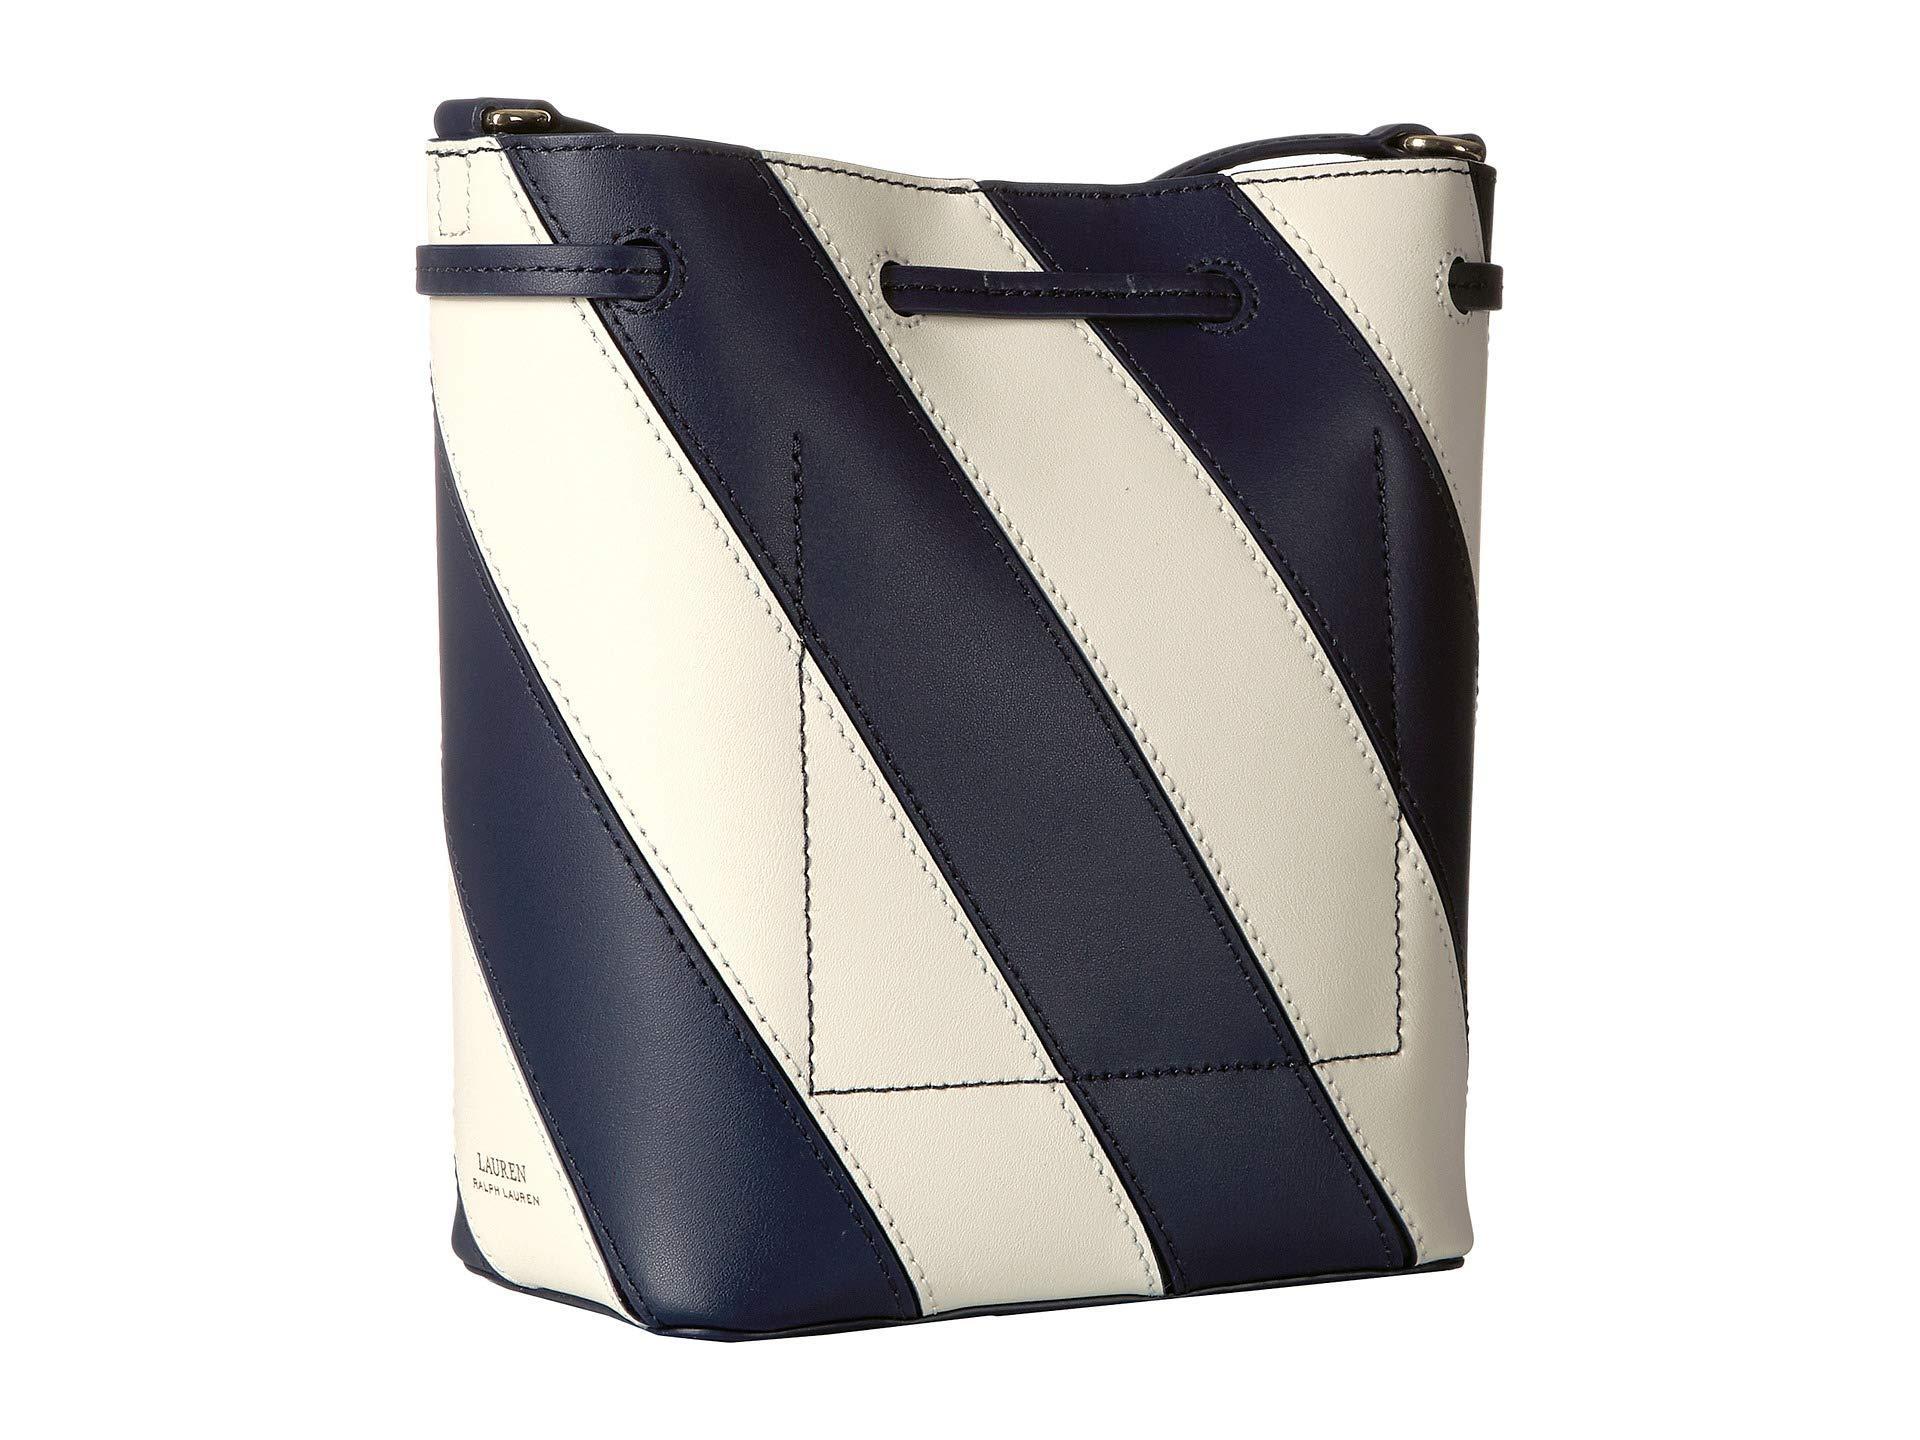 Lyst - Lauren by Ralph Lauren Diagonal Stripe Debby Ii Drawstring ... b24baf270a039